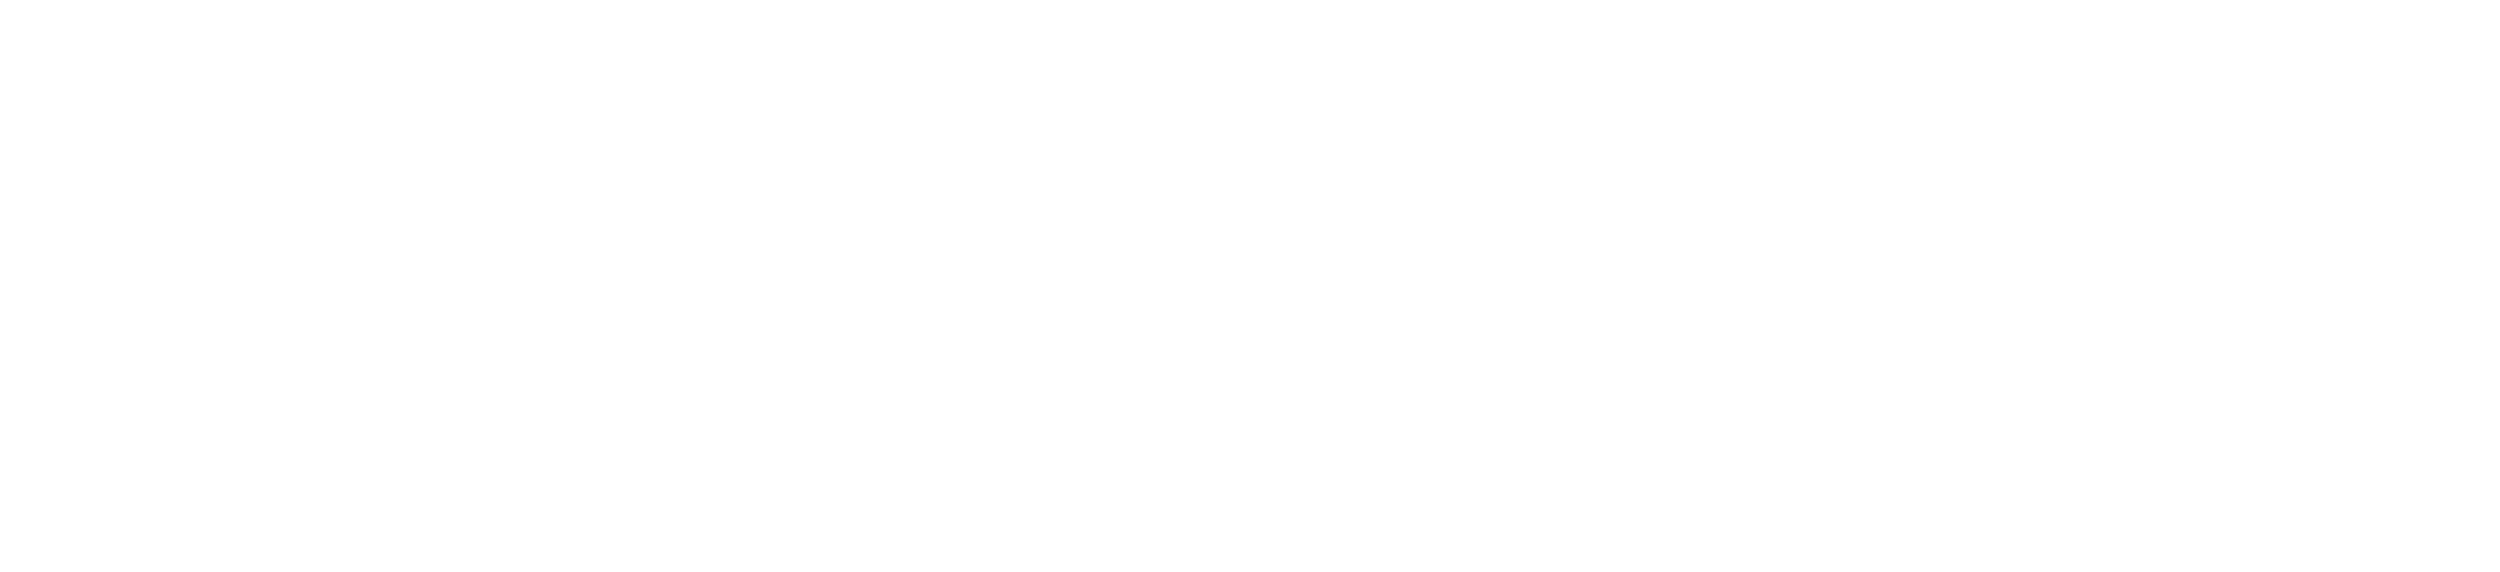 dmlc banner 6.png